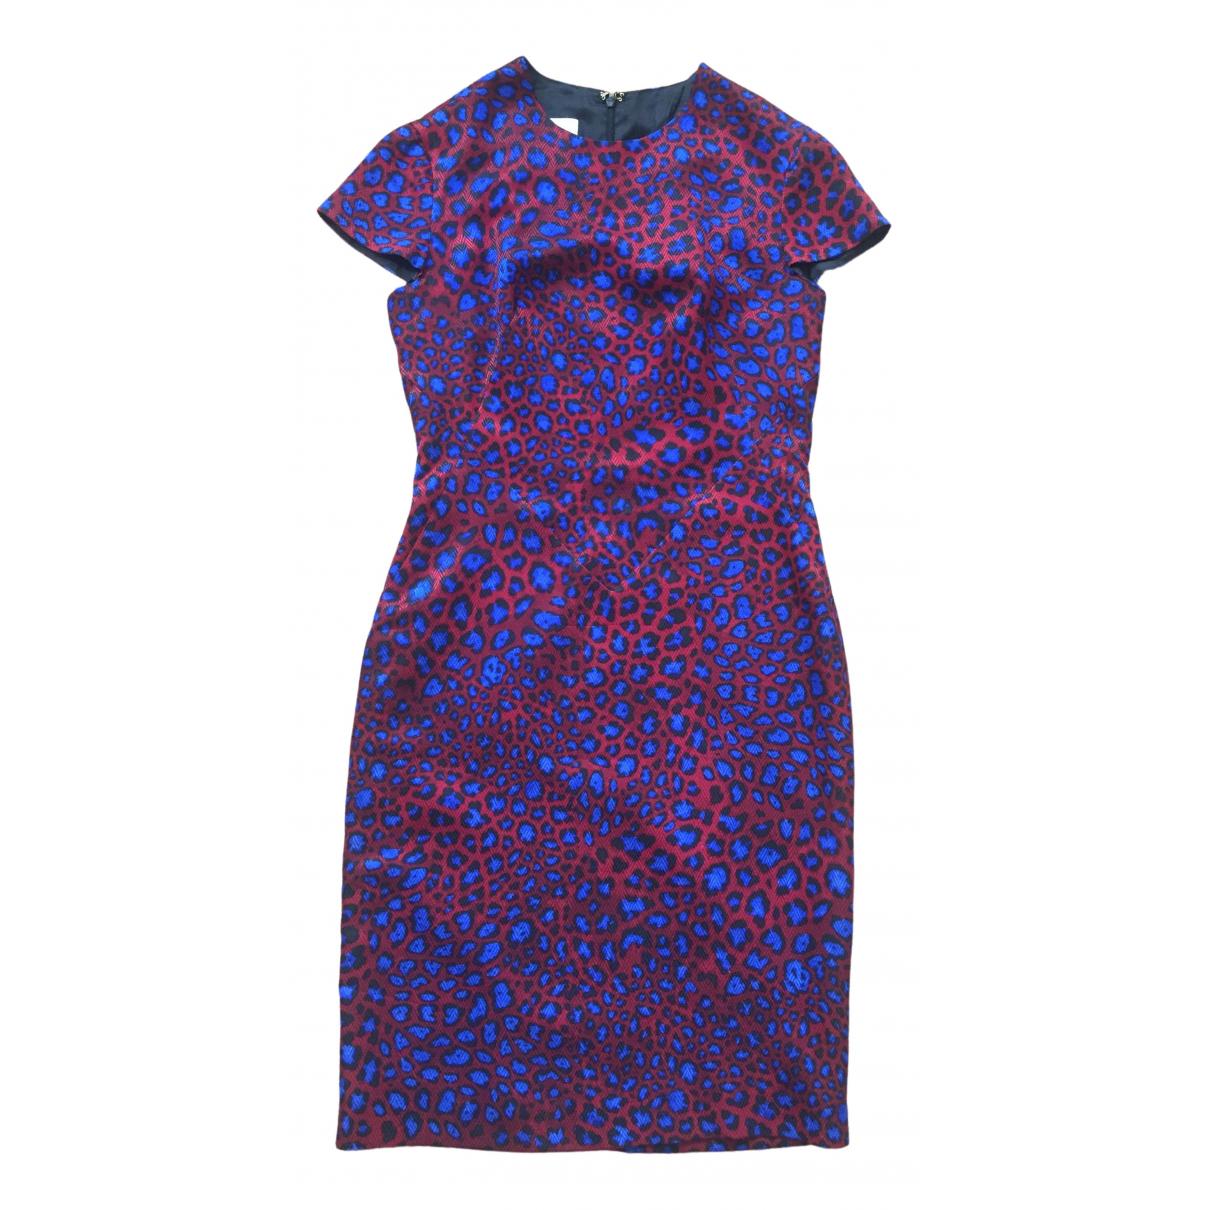 Paul Smith \N Kleid in  Bordeauxrot Wolle